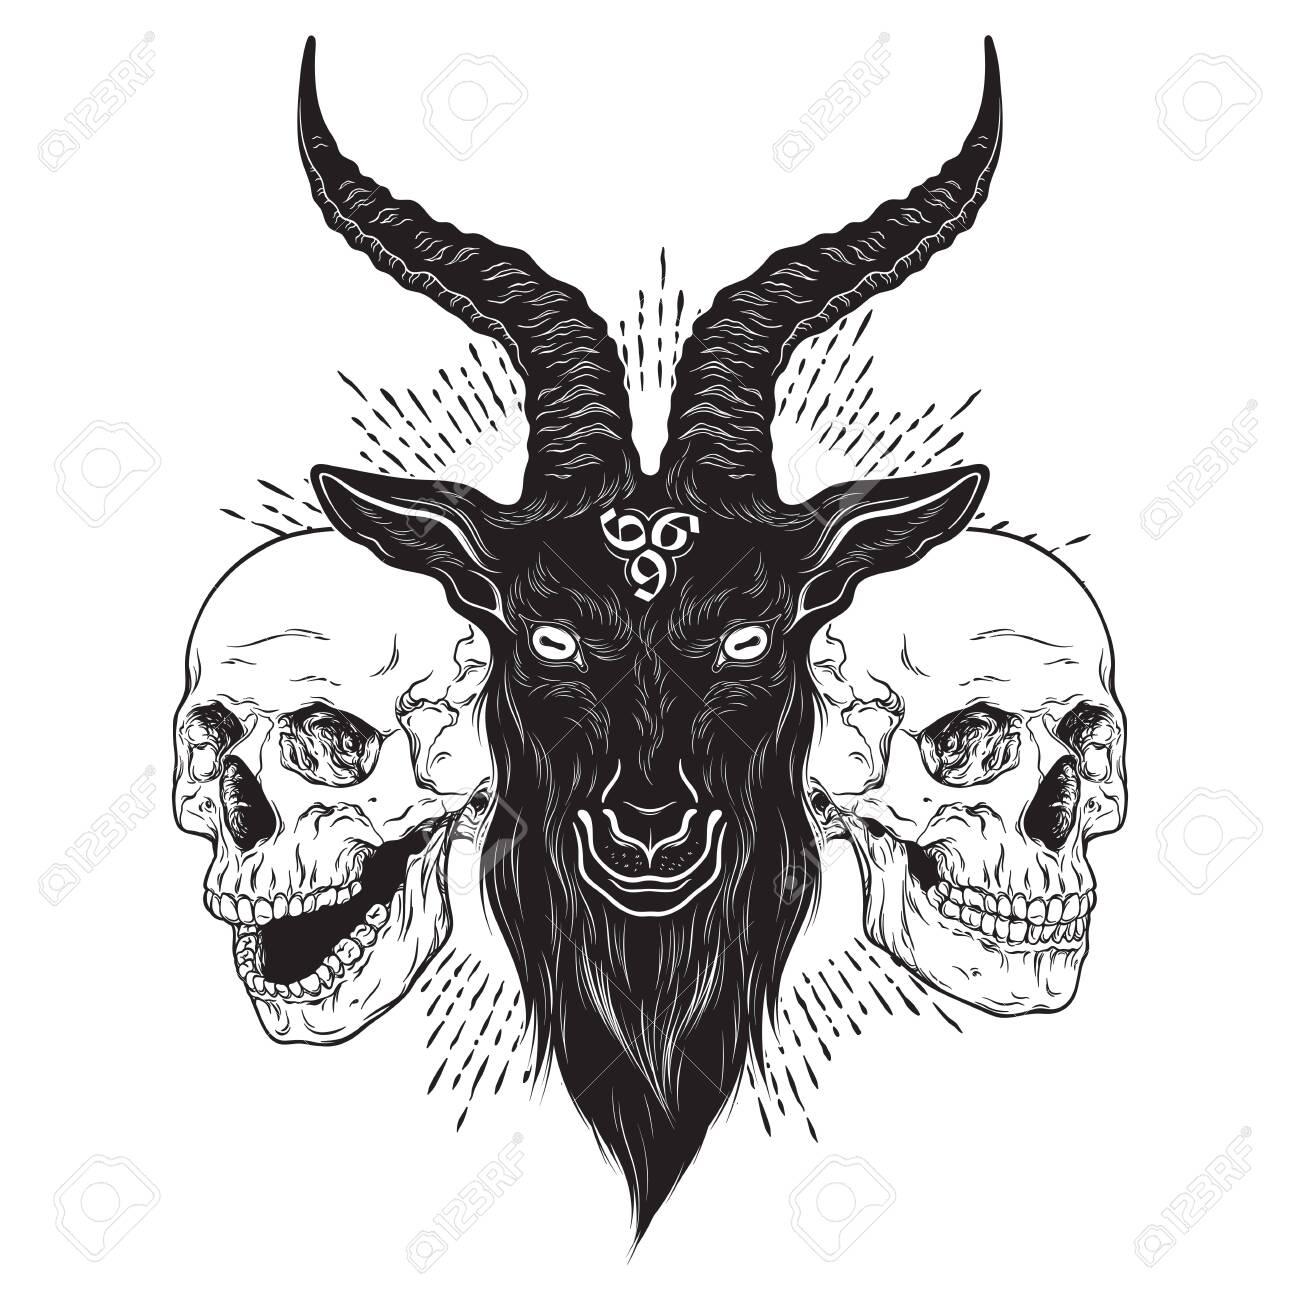 Baphomet demon goat head and human skulls hand drawn print or blackwork flash tattoo art design vector illustration - 145539351